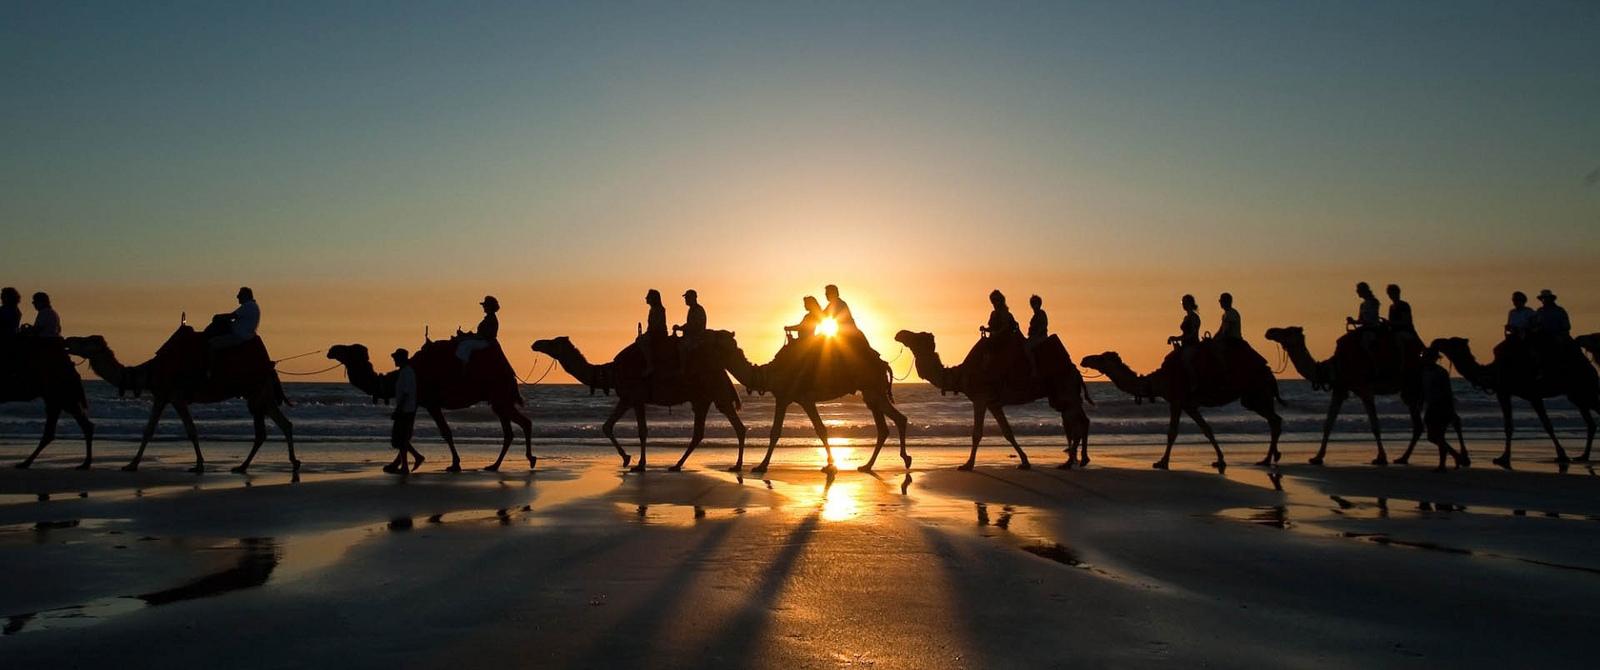 camel day trip